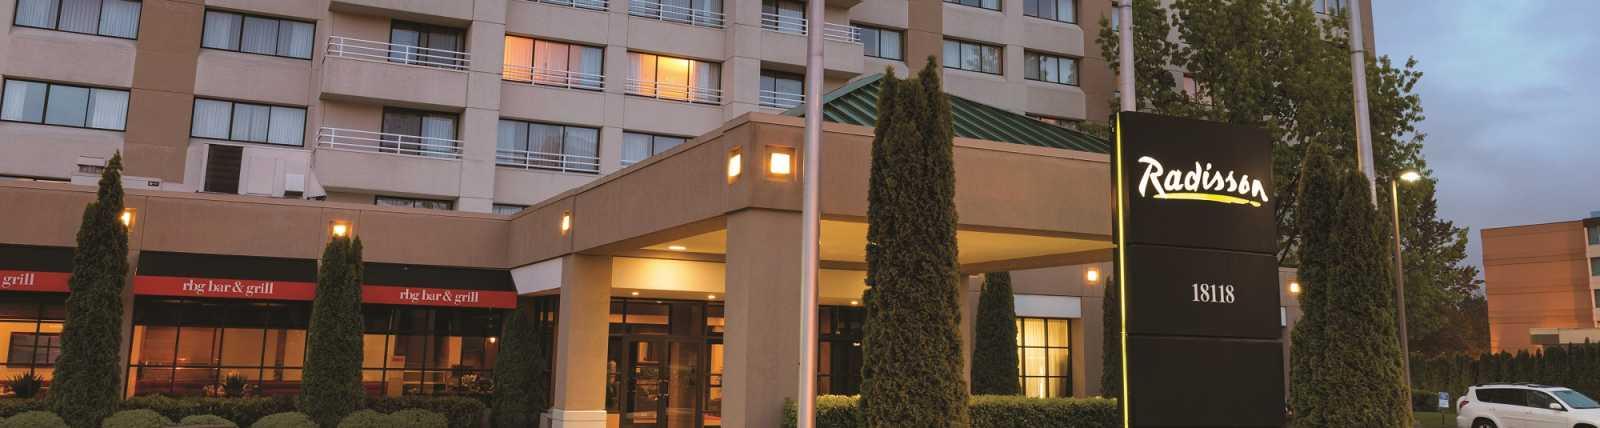 Radisson_Hotel_Seattle_Airport-16.jpg